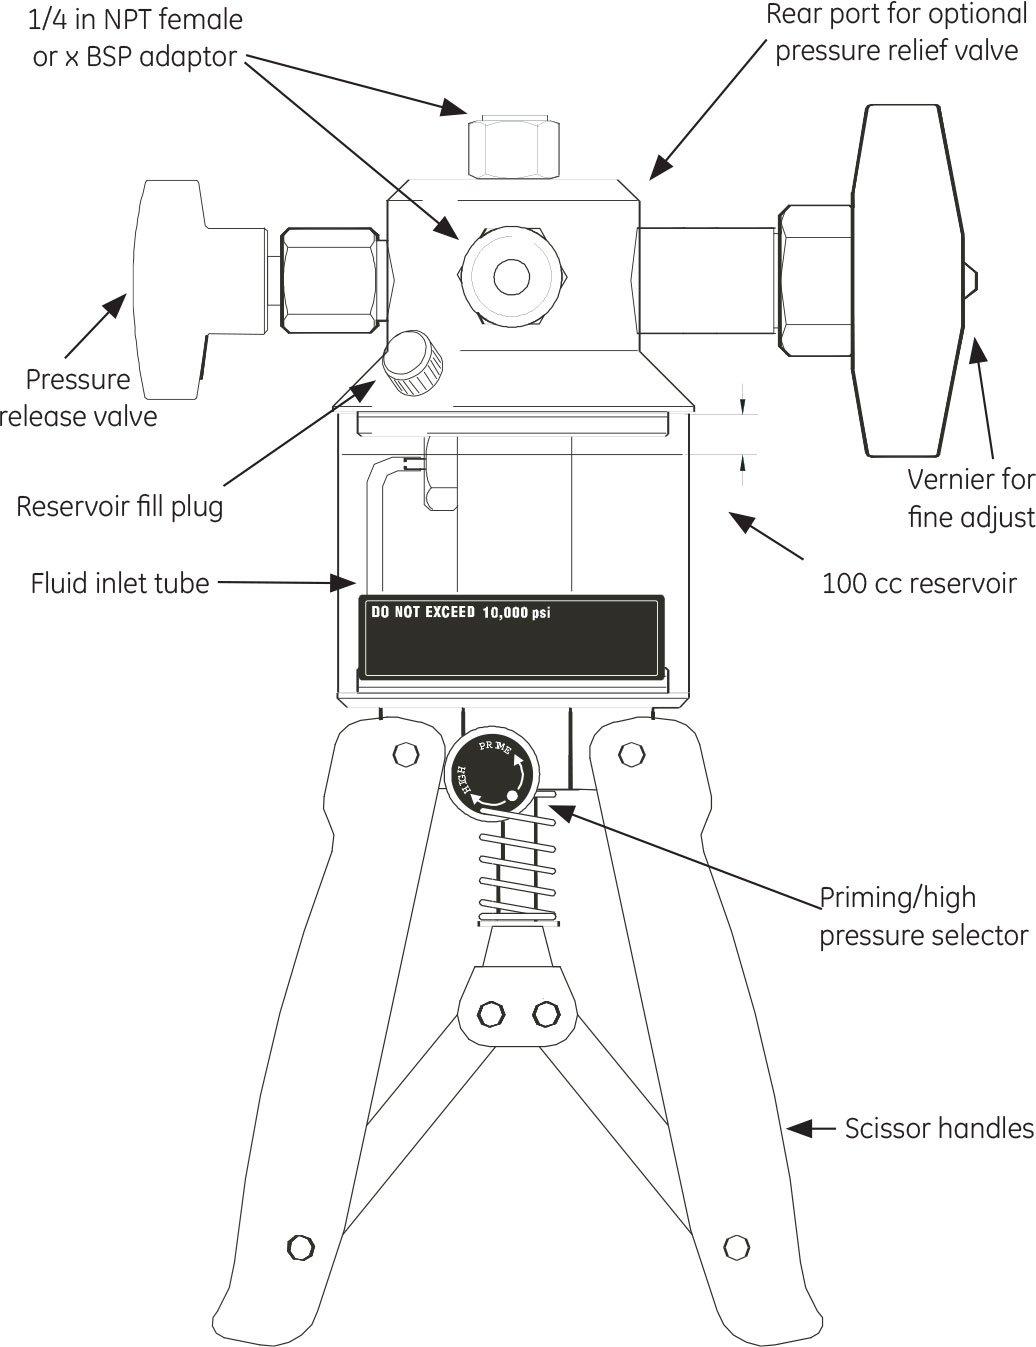 GE Druck PV212-104S-H-2-22-SG Hydraulic Test Kit 10,000